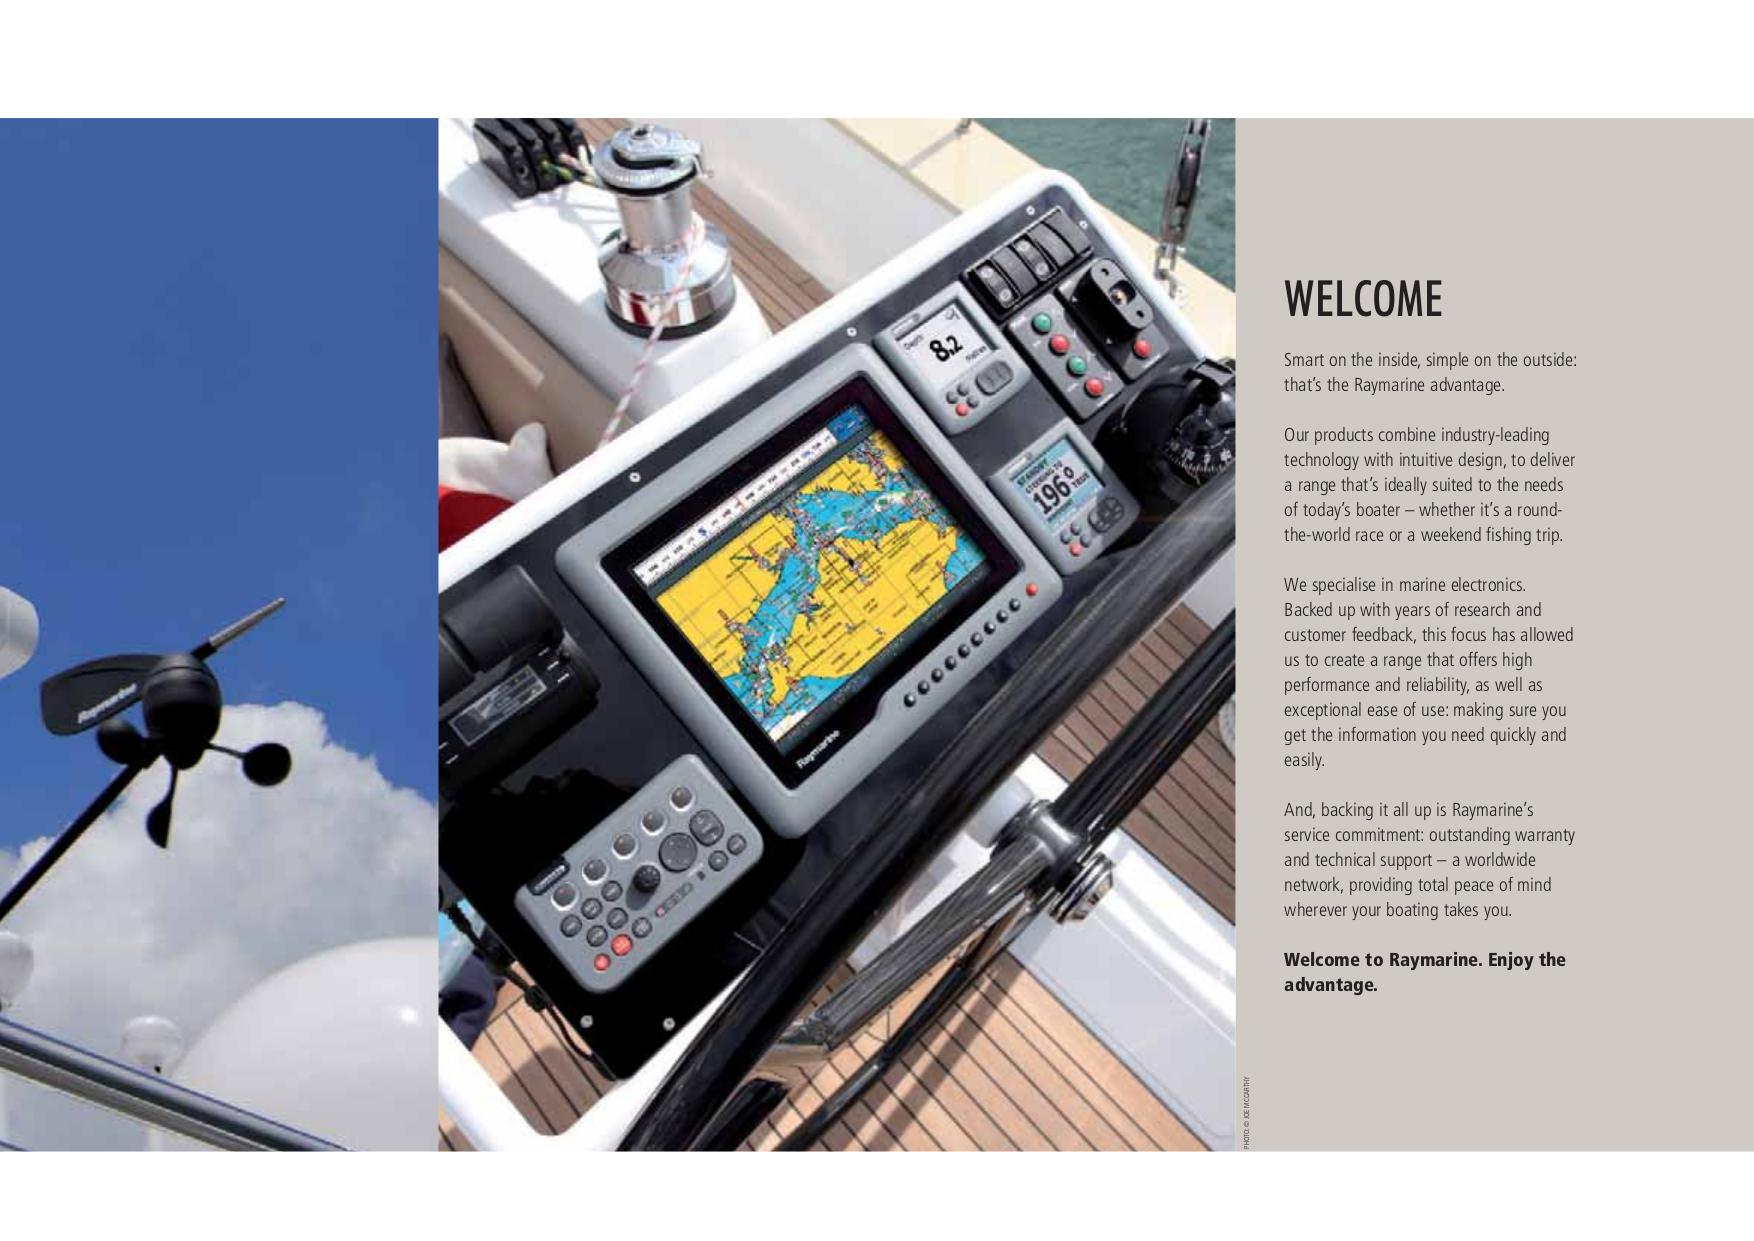 A70d raymarine Manual